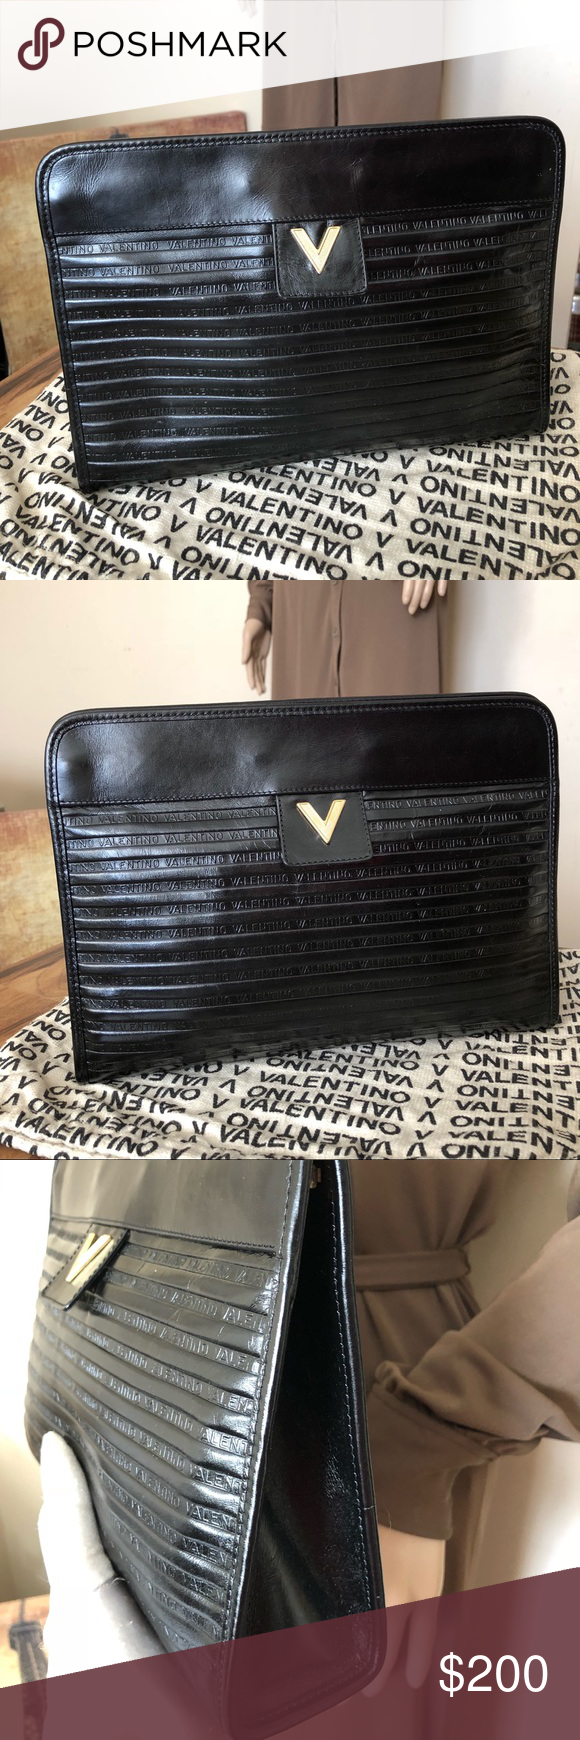 Mario Valentino Black Logo Embossed Vintage Clutch Vintage Clutch Black Leather Clutch Valentino Black